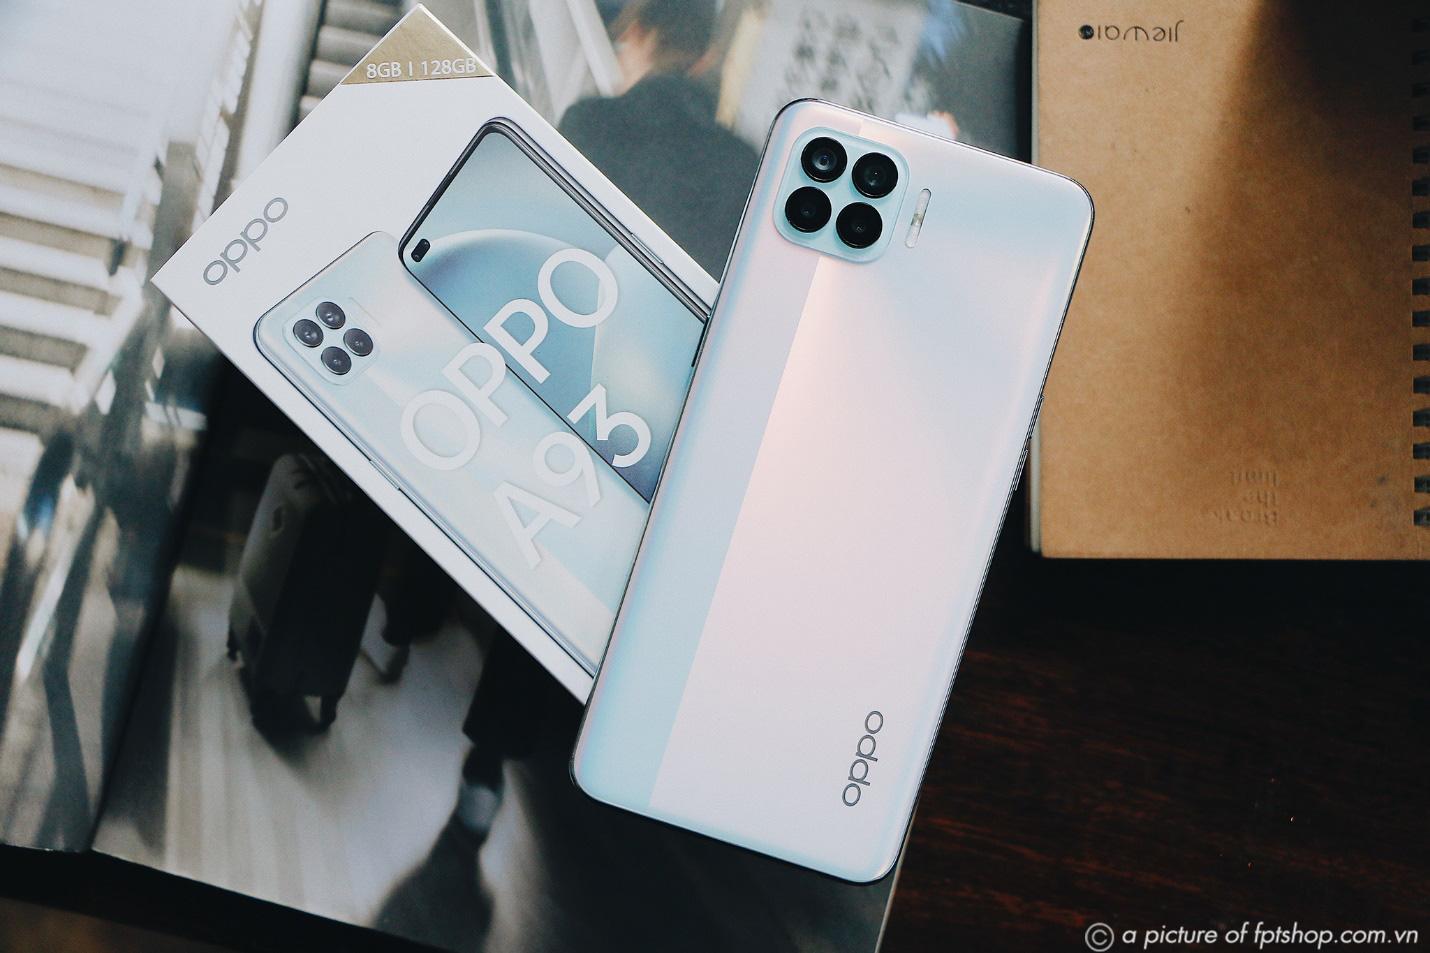 OPPO A Series: Smartphone tầm trung làm rung rinh giới trẻ tại FPT Shop - Ảnh 2.